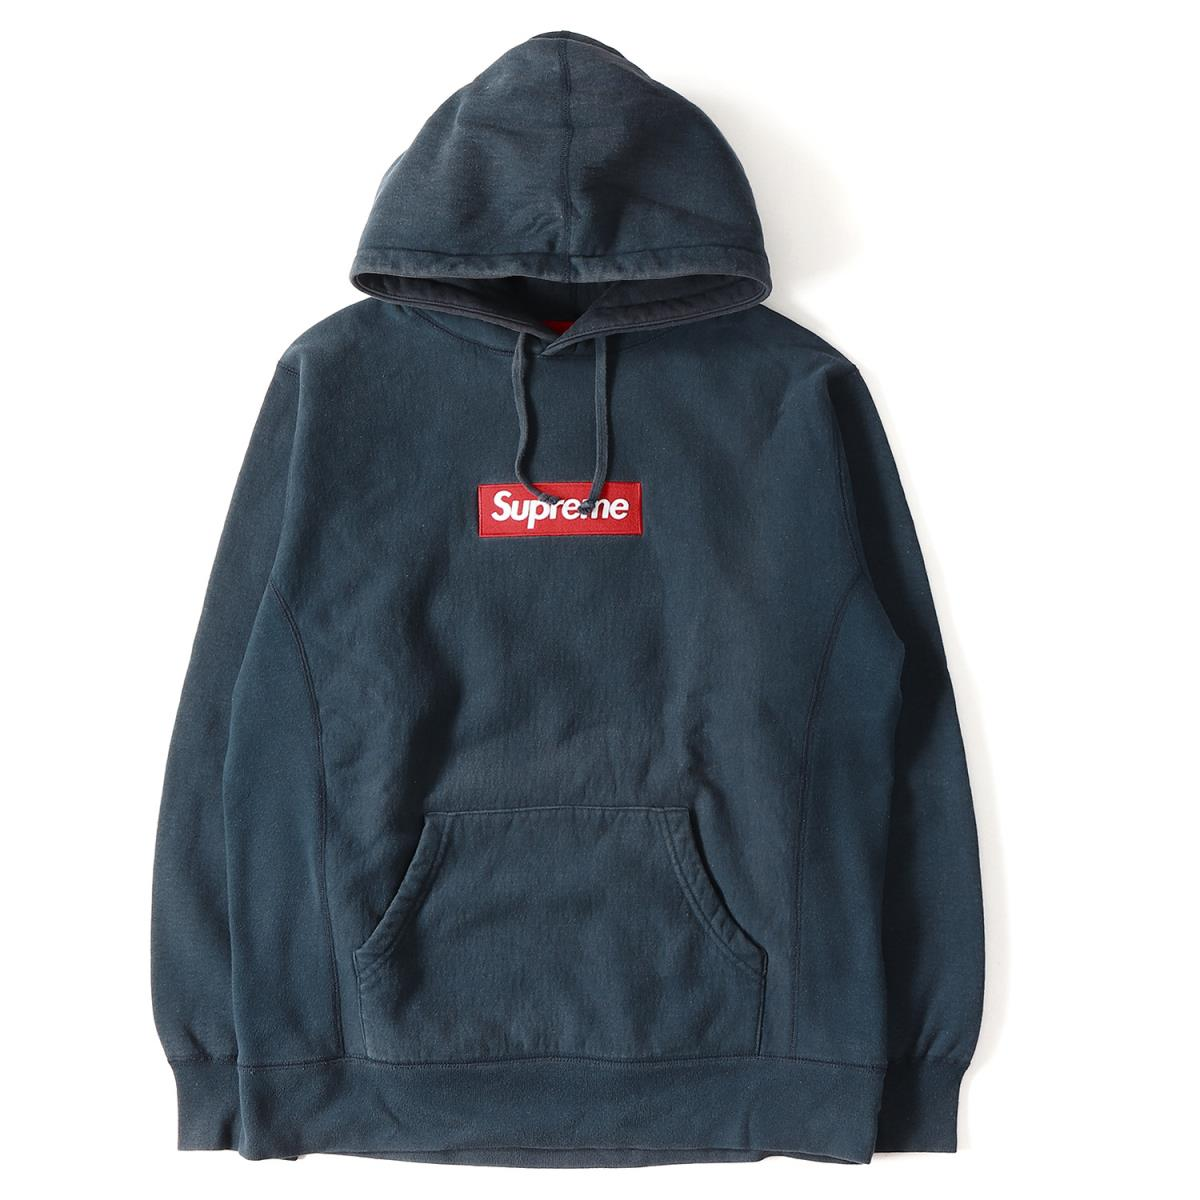 Supreme (シュプリーム) 12A/W BOXロゴスウェットパーカー(Box Logo Pullover) ネイビー L 【メンズ】【K2065】【中古】【あす楽☆対応可】